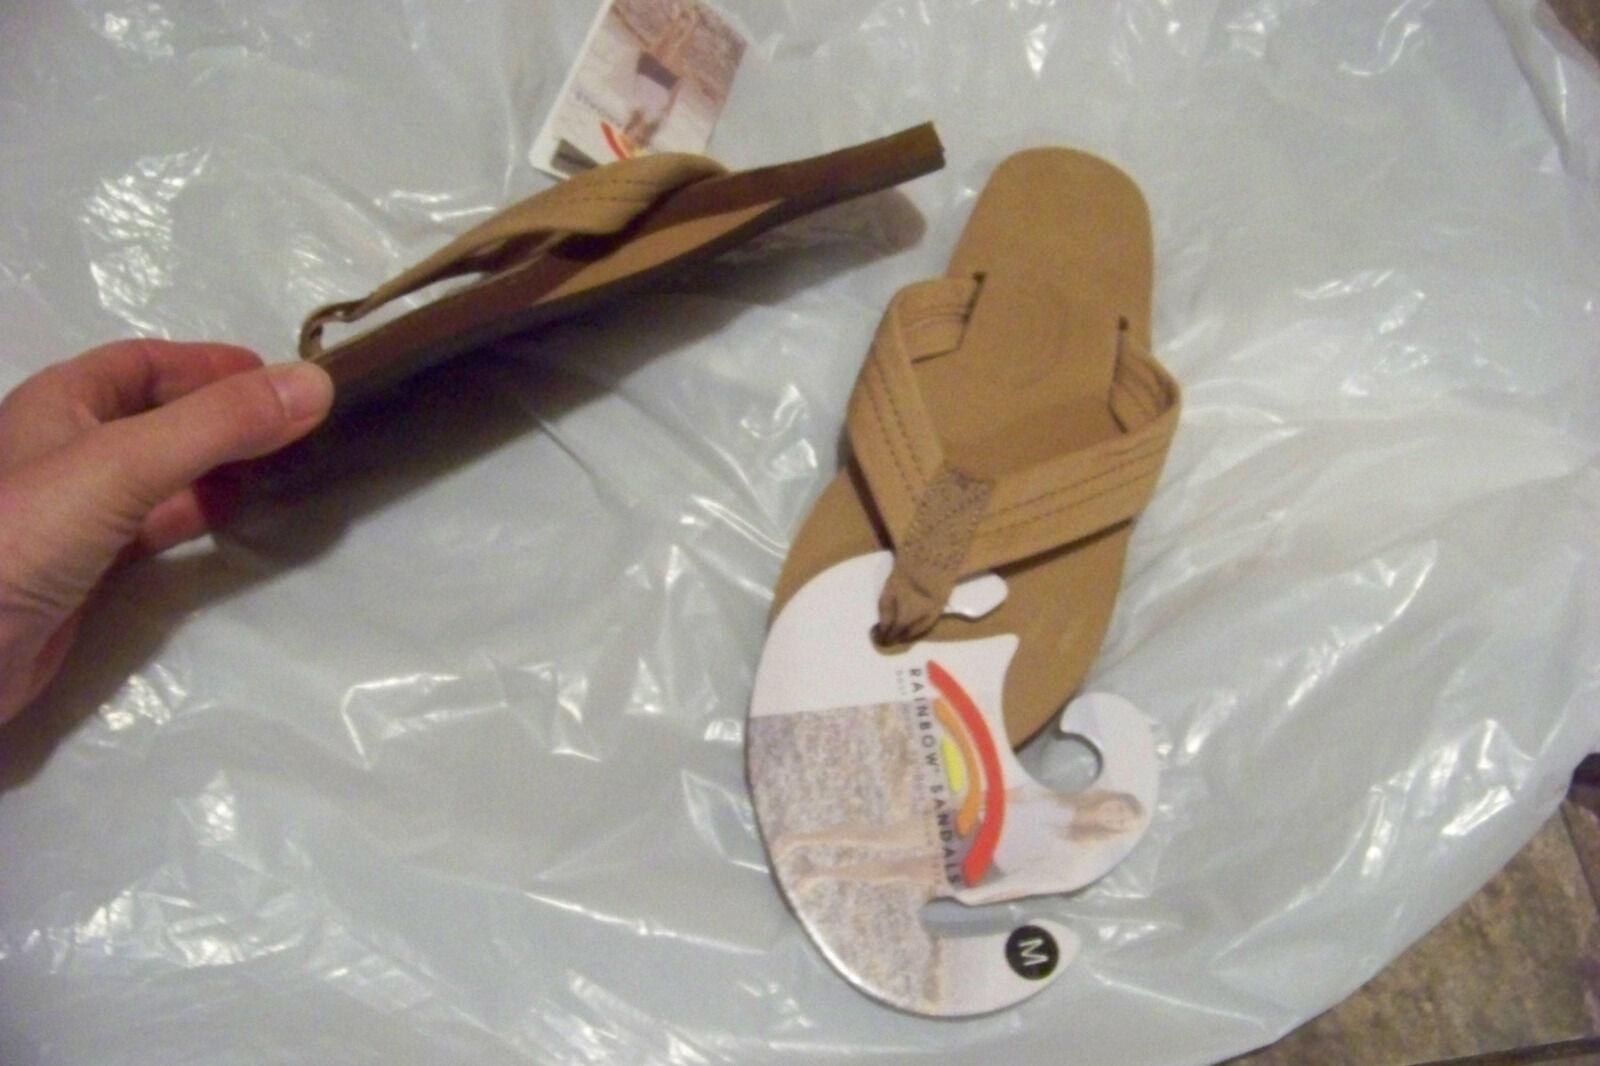 New femmes rainbow premier sierra leather flip flops sandals chaussures sz m 6.5-7.5